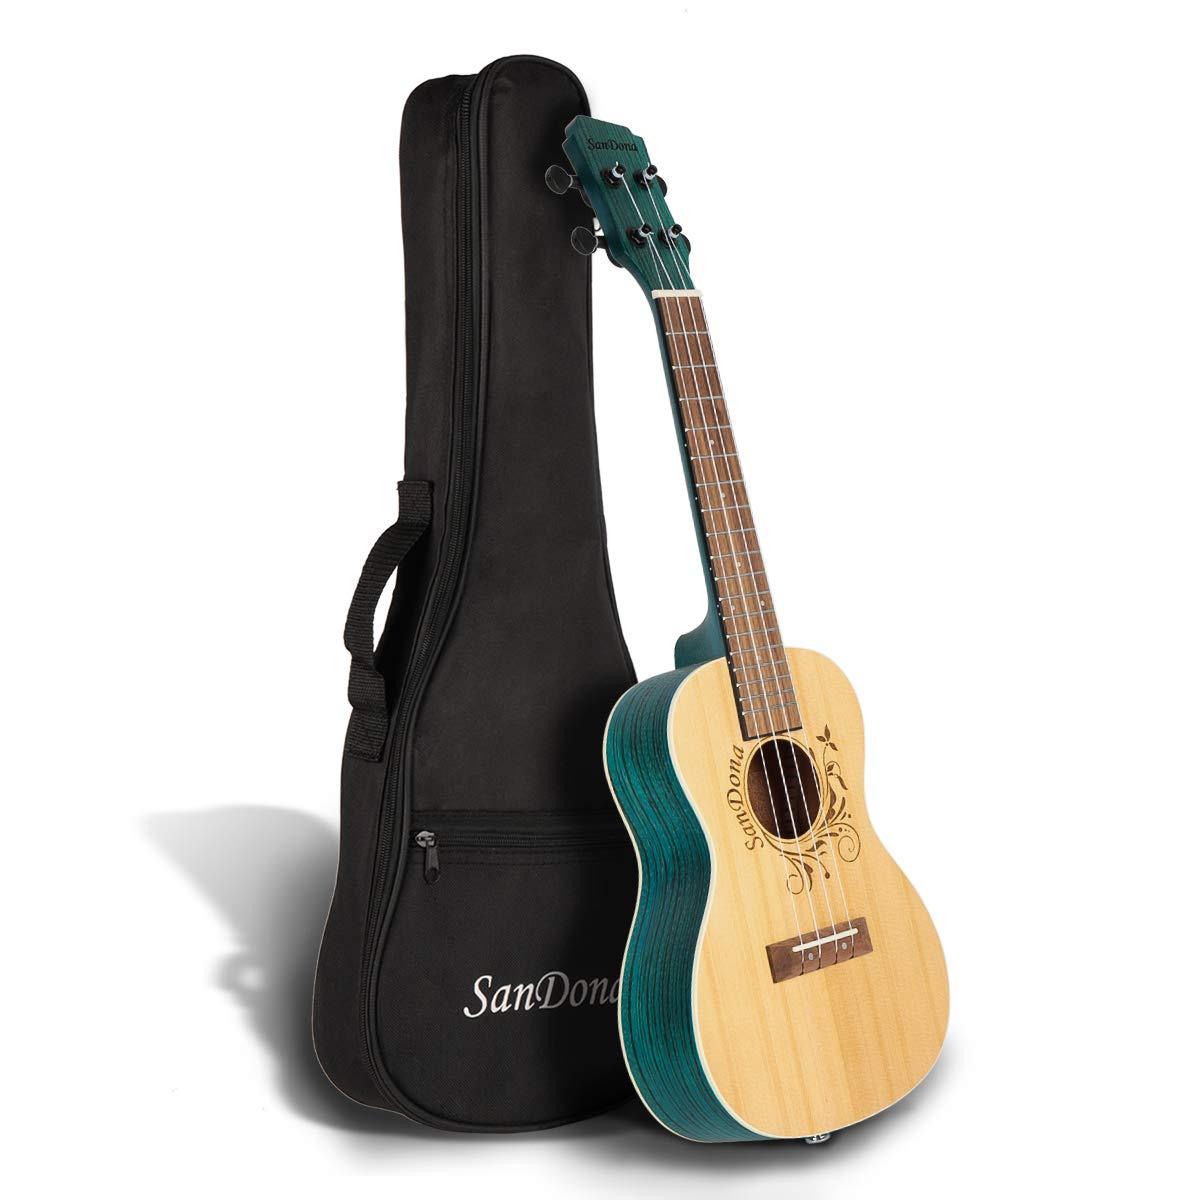 SANDONA Acoustic Electric Concert Ukulele EQ 24 Inch Kit eUKC-141 | Spruce Solid Wood | Under-Saddle Piezo Bridge Pickup, Strap, Aquila Strings, Digital Tuner and Gig bag (Latte) Hommii